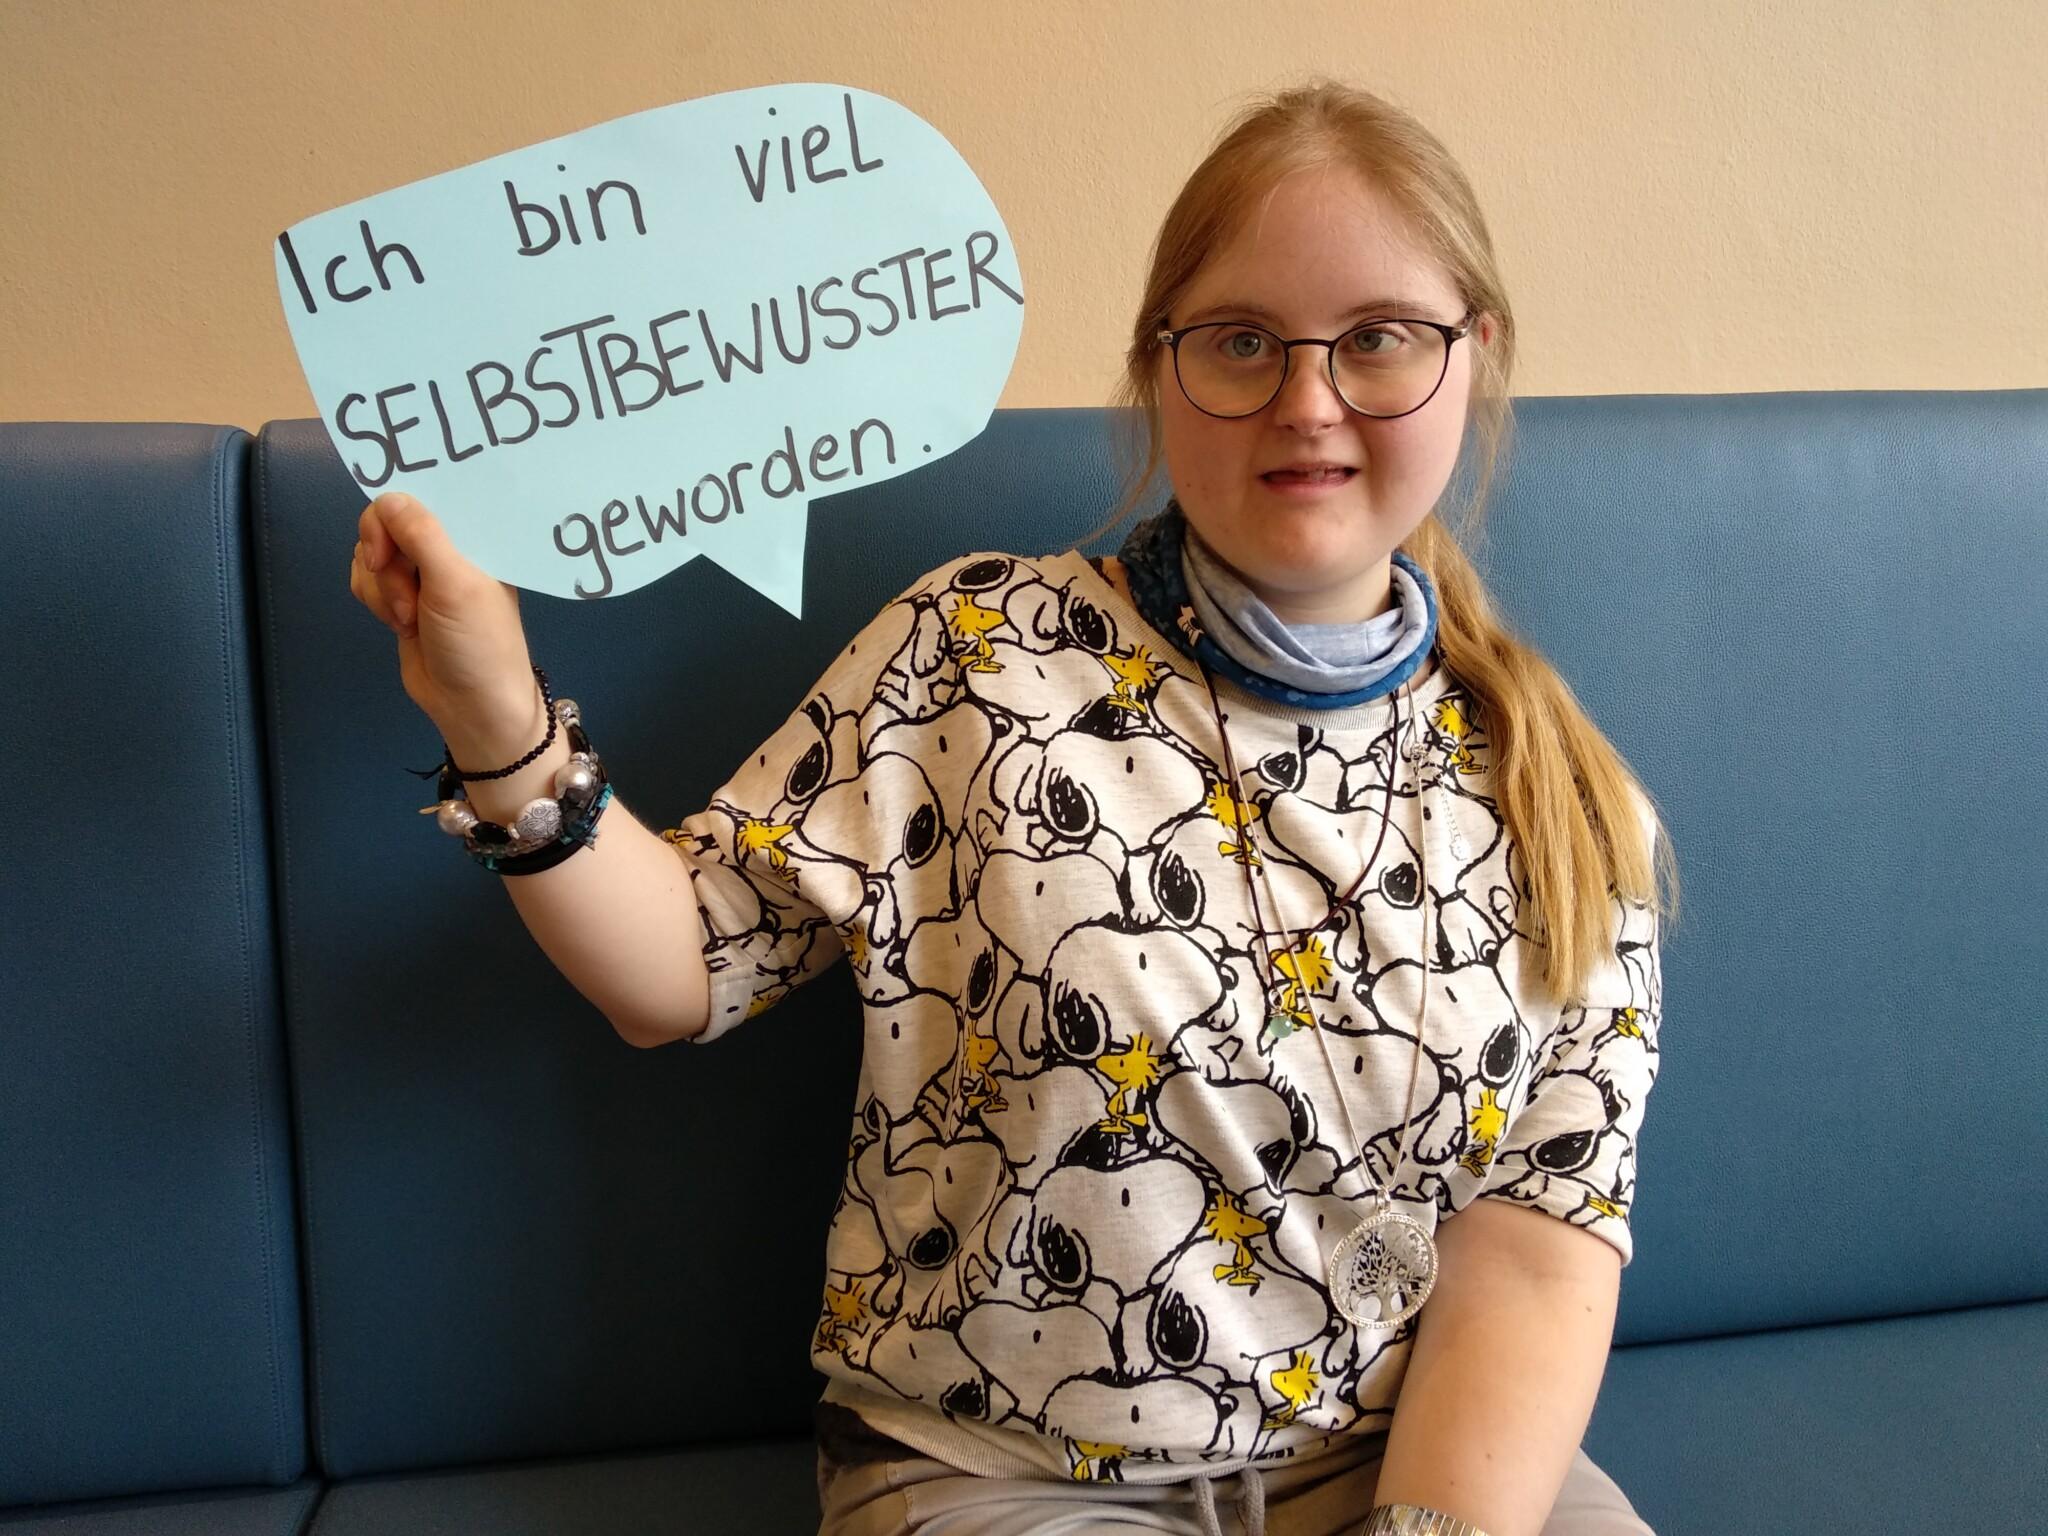 Pllau single frauen - Seebach exklusive partnervermittlung